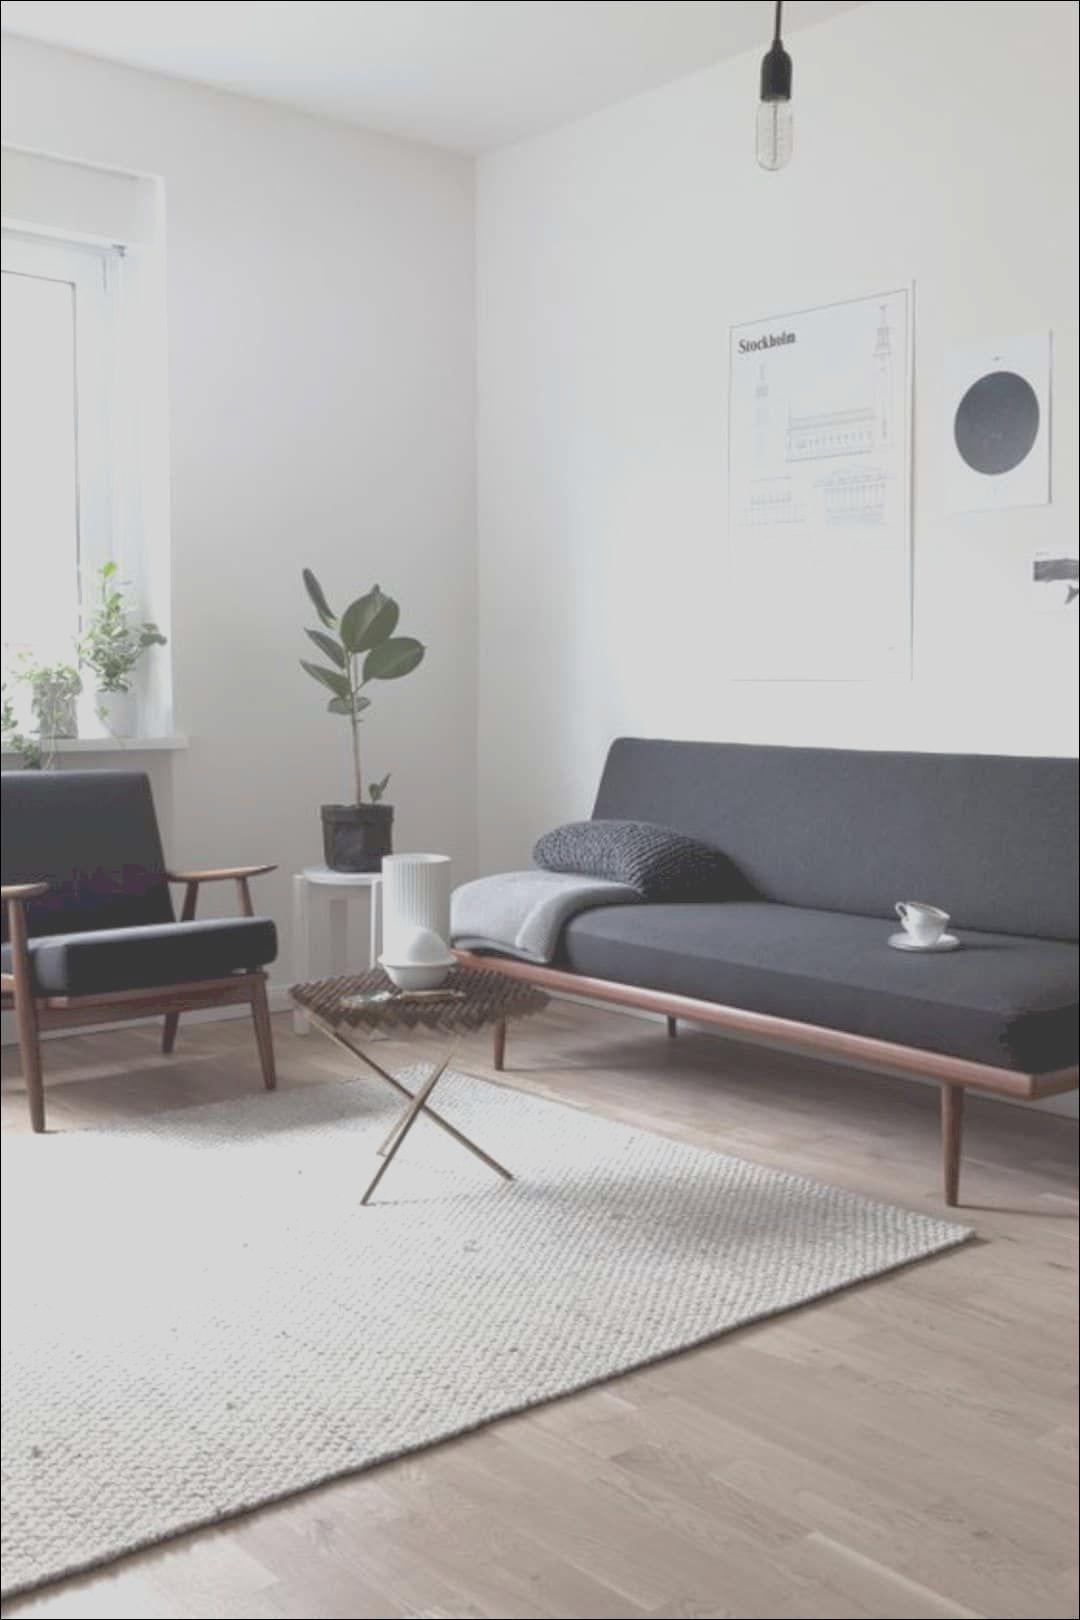 16 Simple Interior Design Ideas For Living Room In 2020 Living Room Scandinavian Minimalist Living Room Design Minimalist Living Room